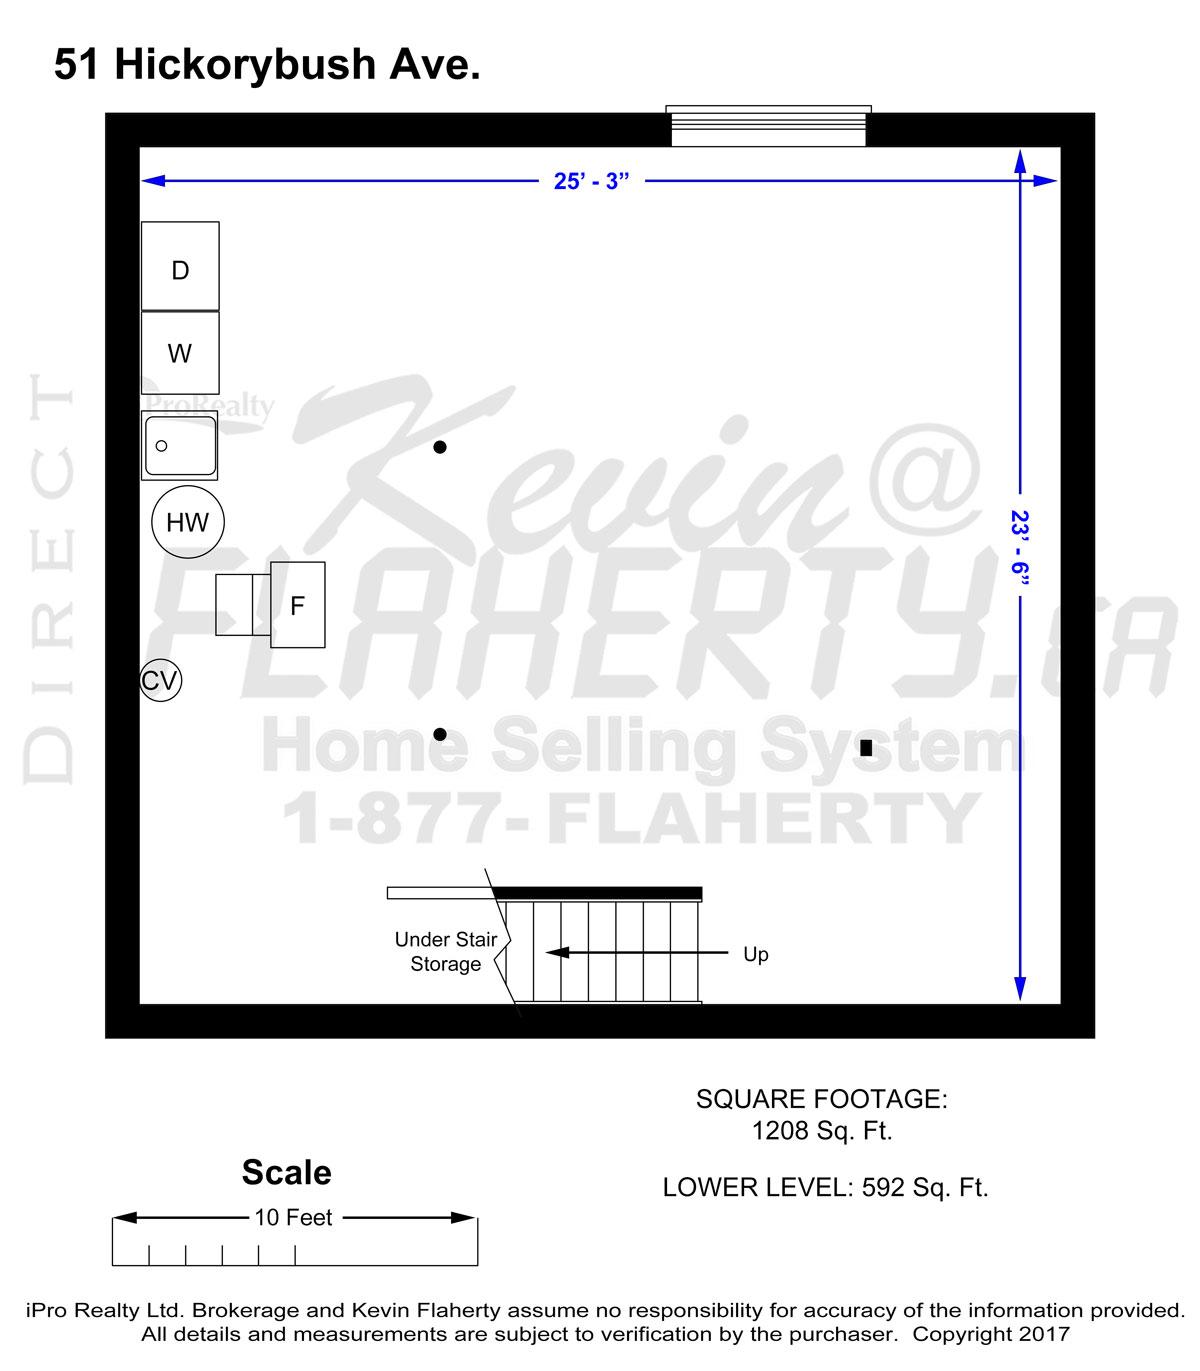 51 Hickorybush Ave Brampton Real Estate Listing